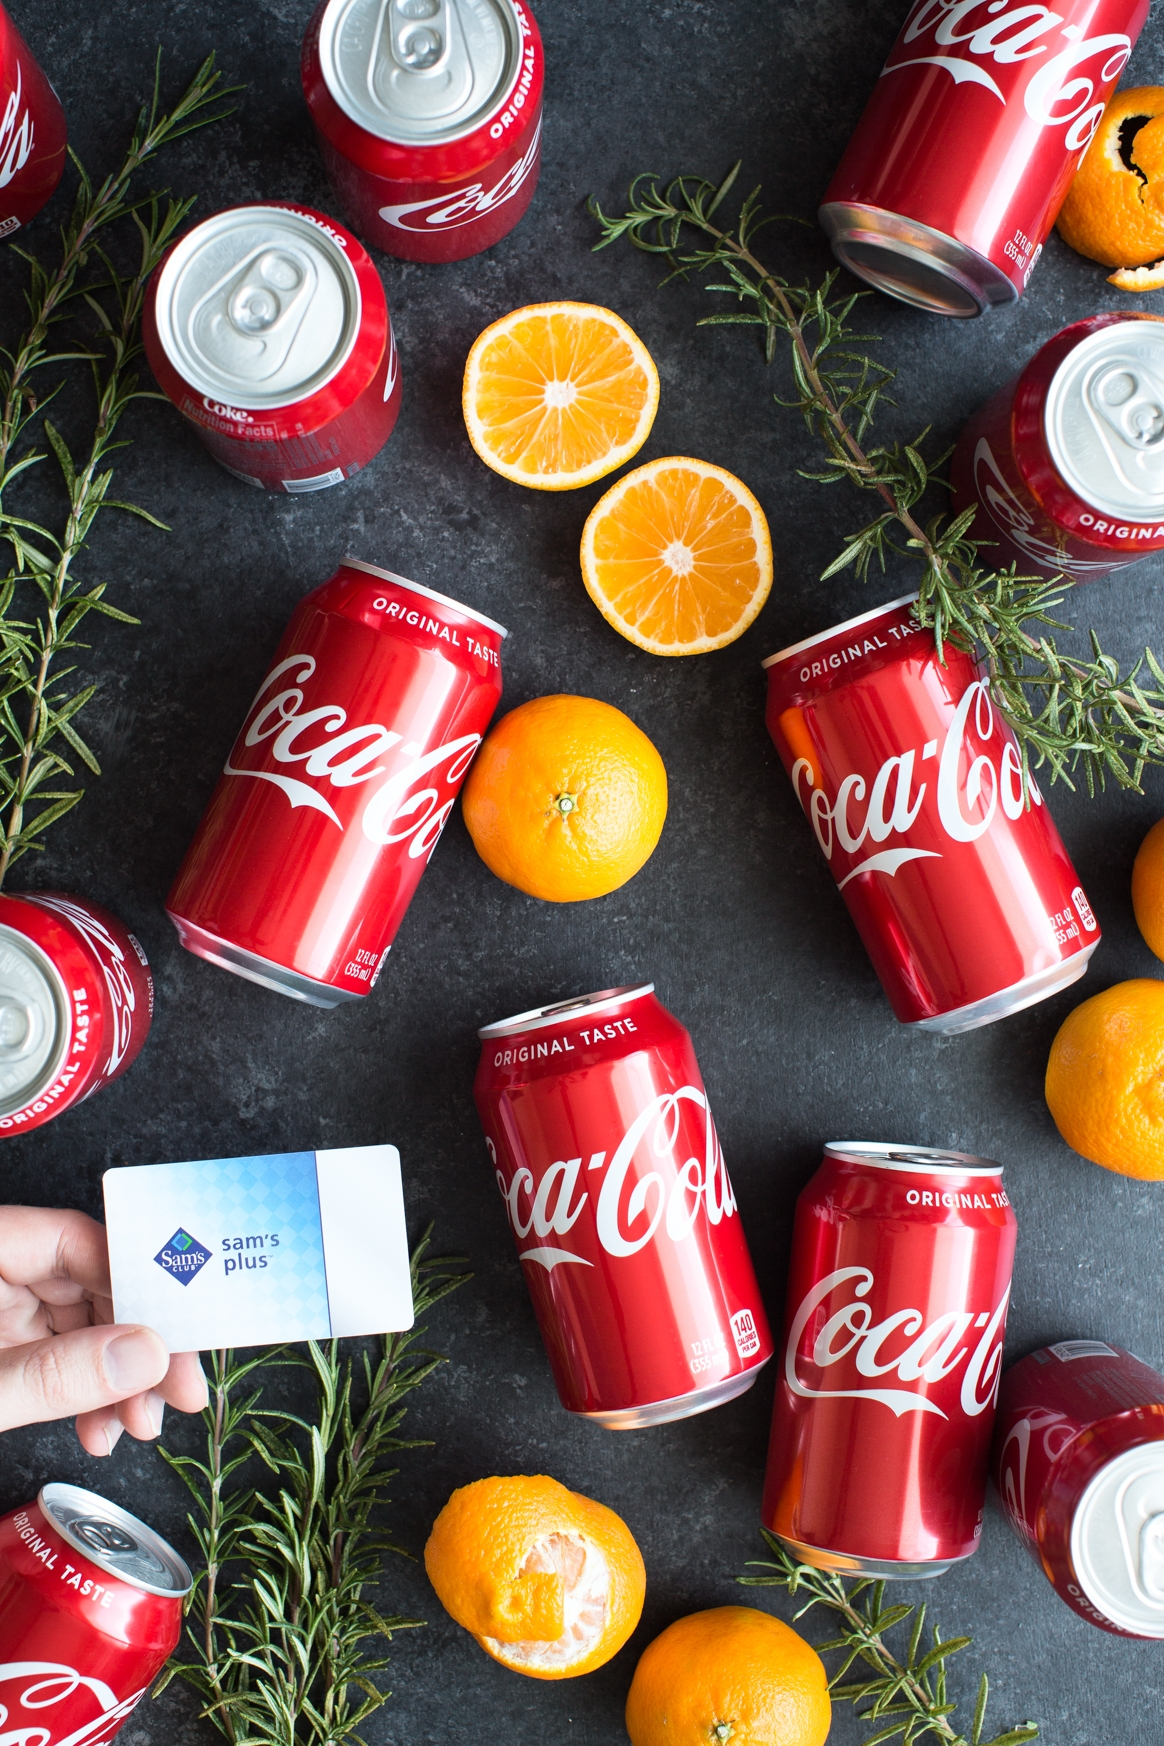 Coca-Cola and Sam's Club